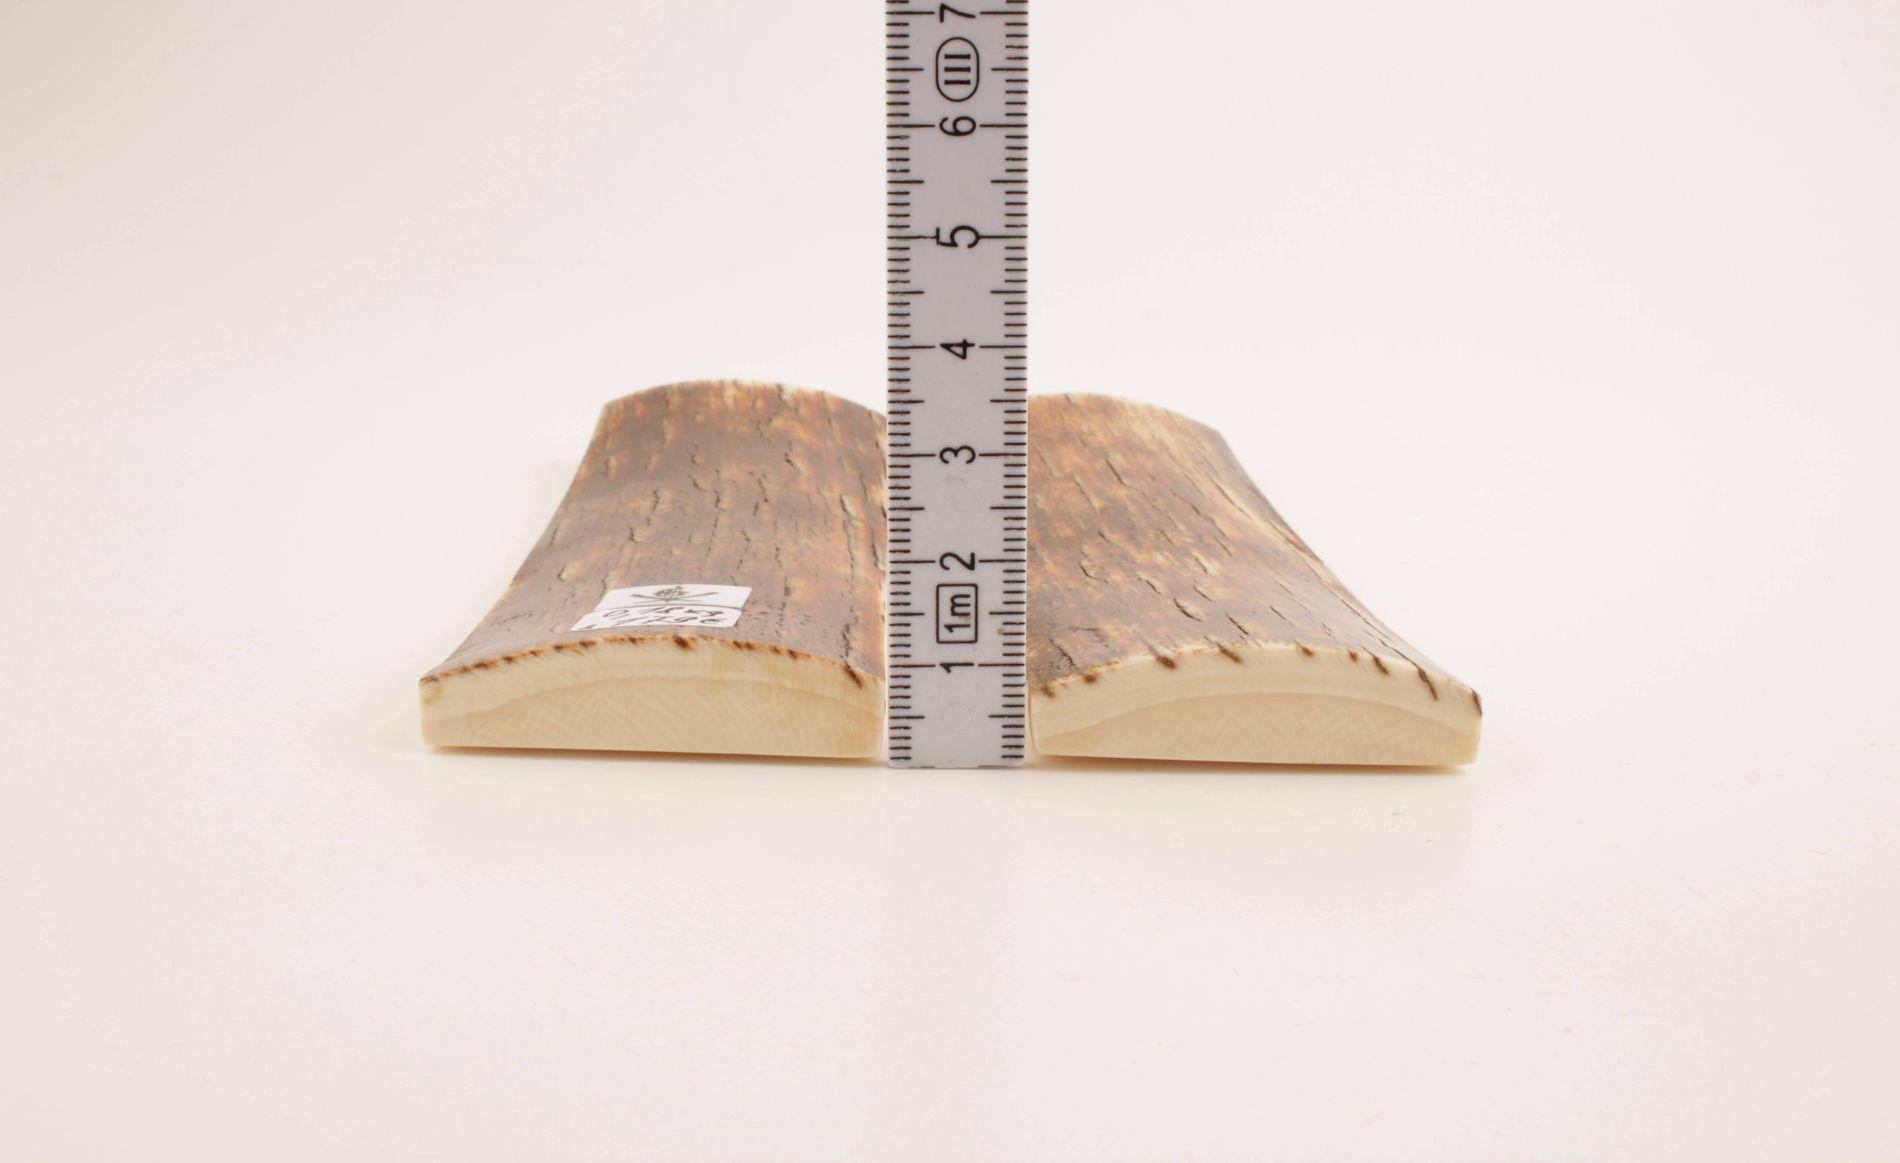 Orange-brown natural mammoth bark scales